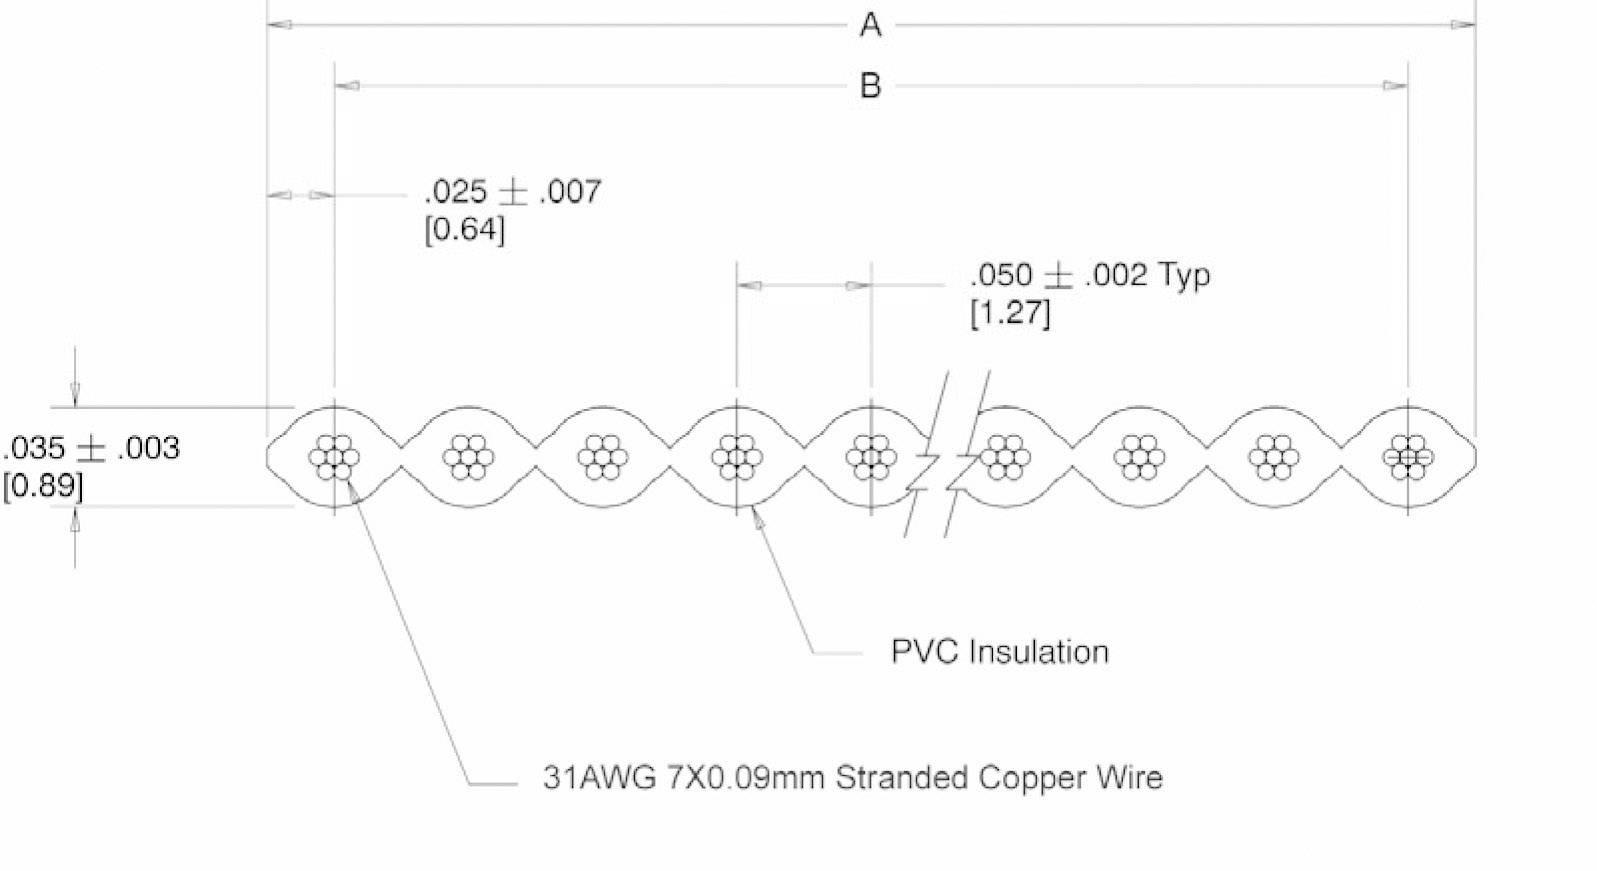 Plochý kabel Flachband cable 40P (SH1998C206), nestíněný, 30.5 m, šedá